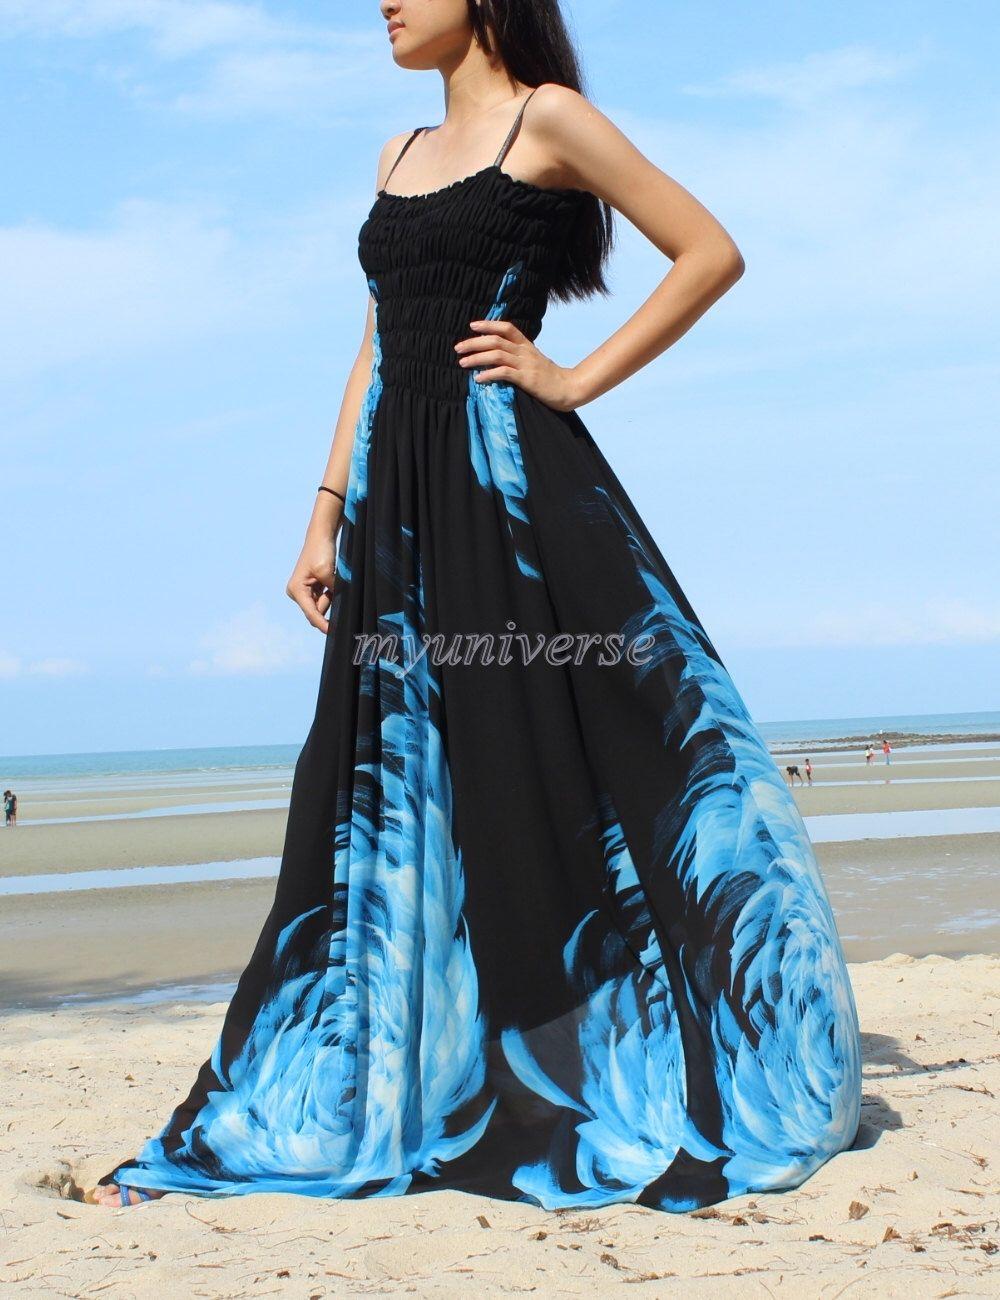 Maxi Dress Wedding Gown Black Bridesmaid Dress Prom Summer Plus Size Clothing Floral Evening Dress Sundres Floral Evening Dresses Maxi Dress Maxi Dress Wedding [ 1300 x 1000 Pixel ]